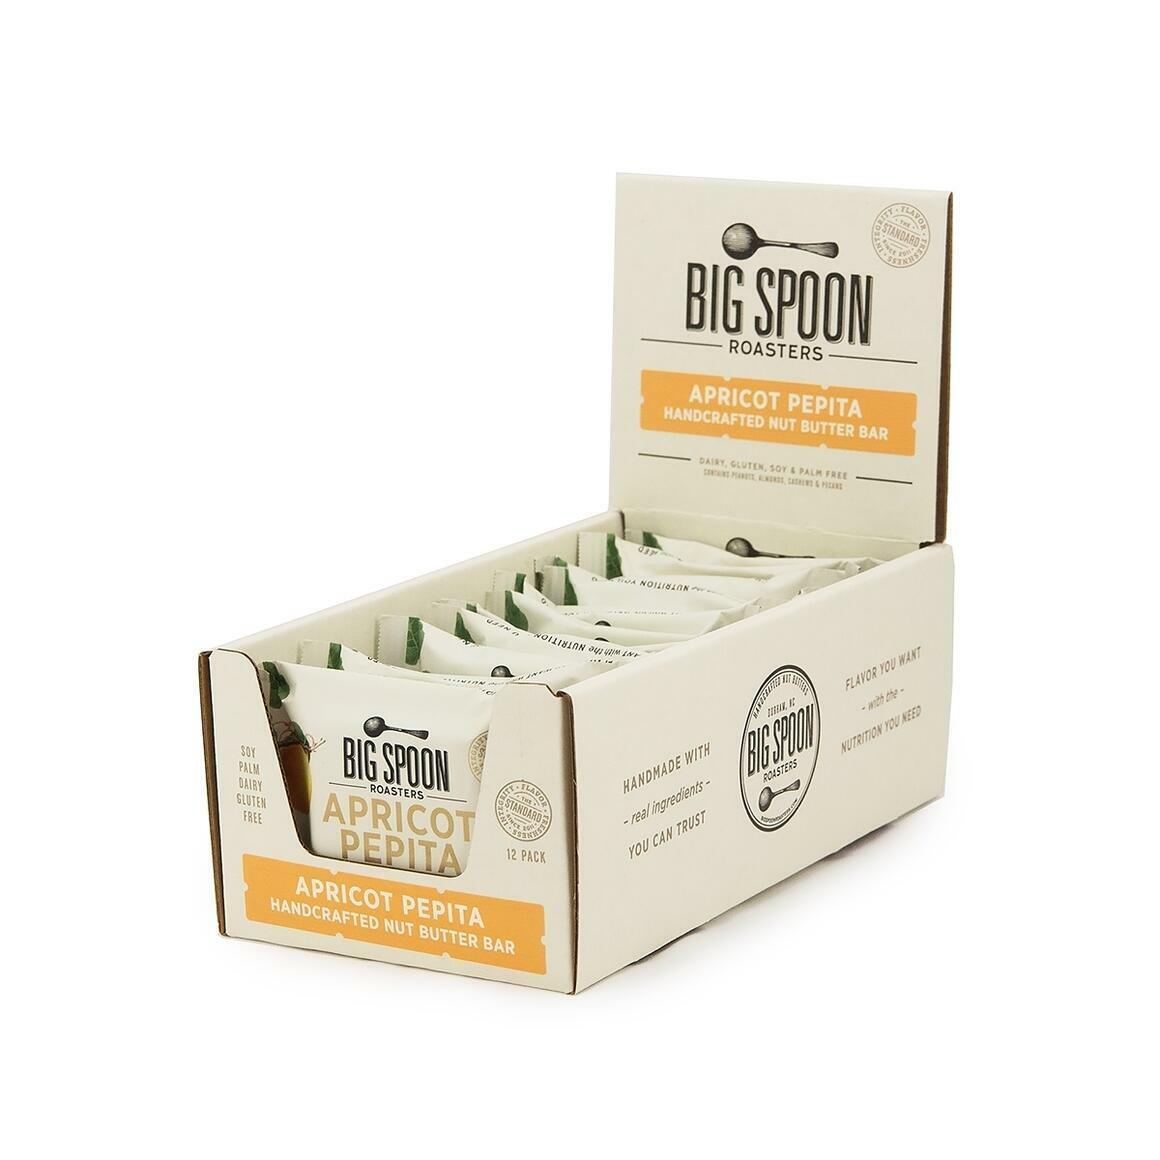 Big Spoon Roasters Apricot Pepita | Trada Marketplace